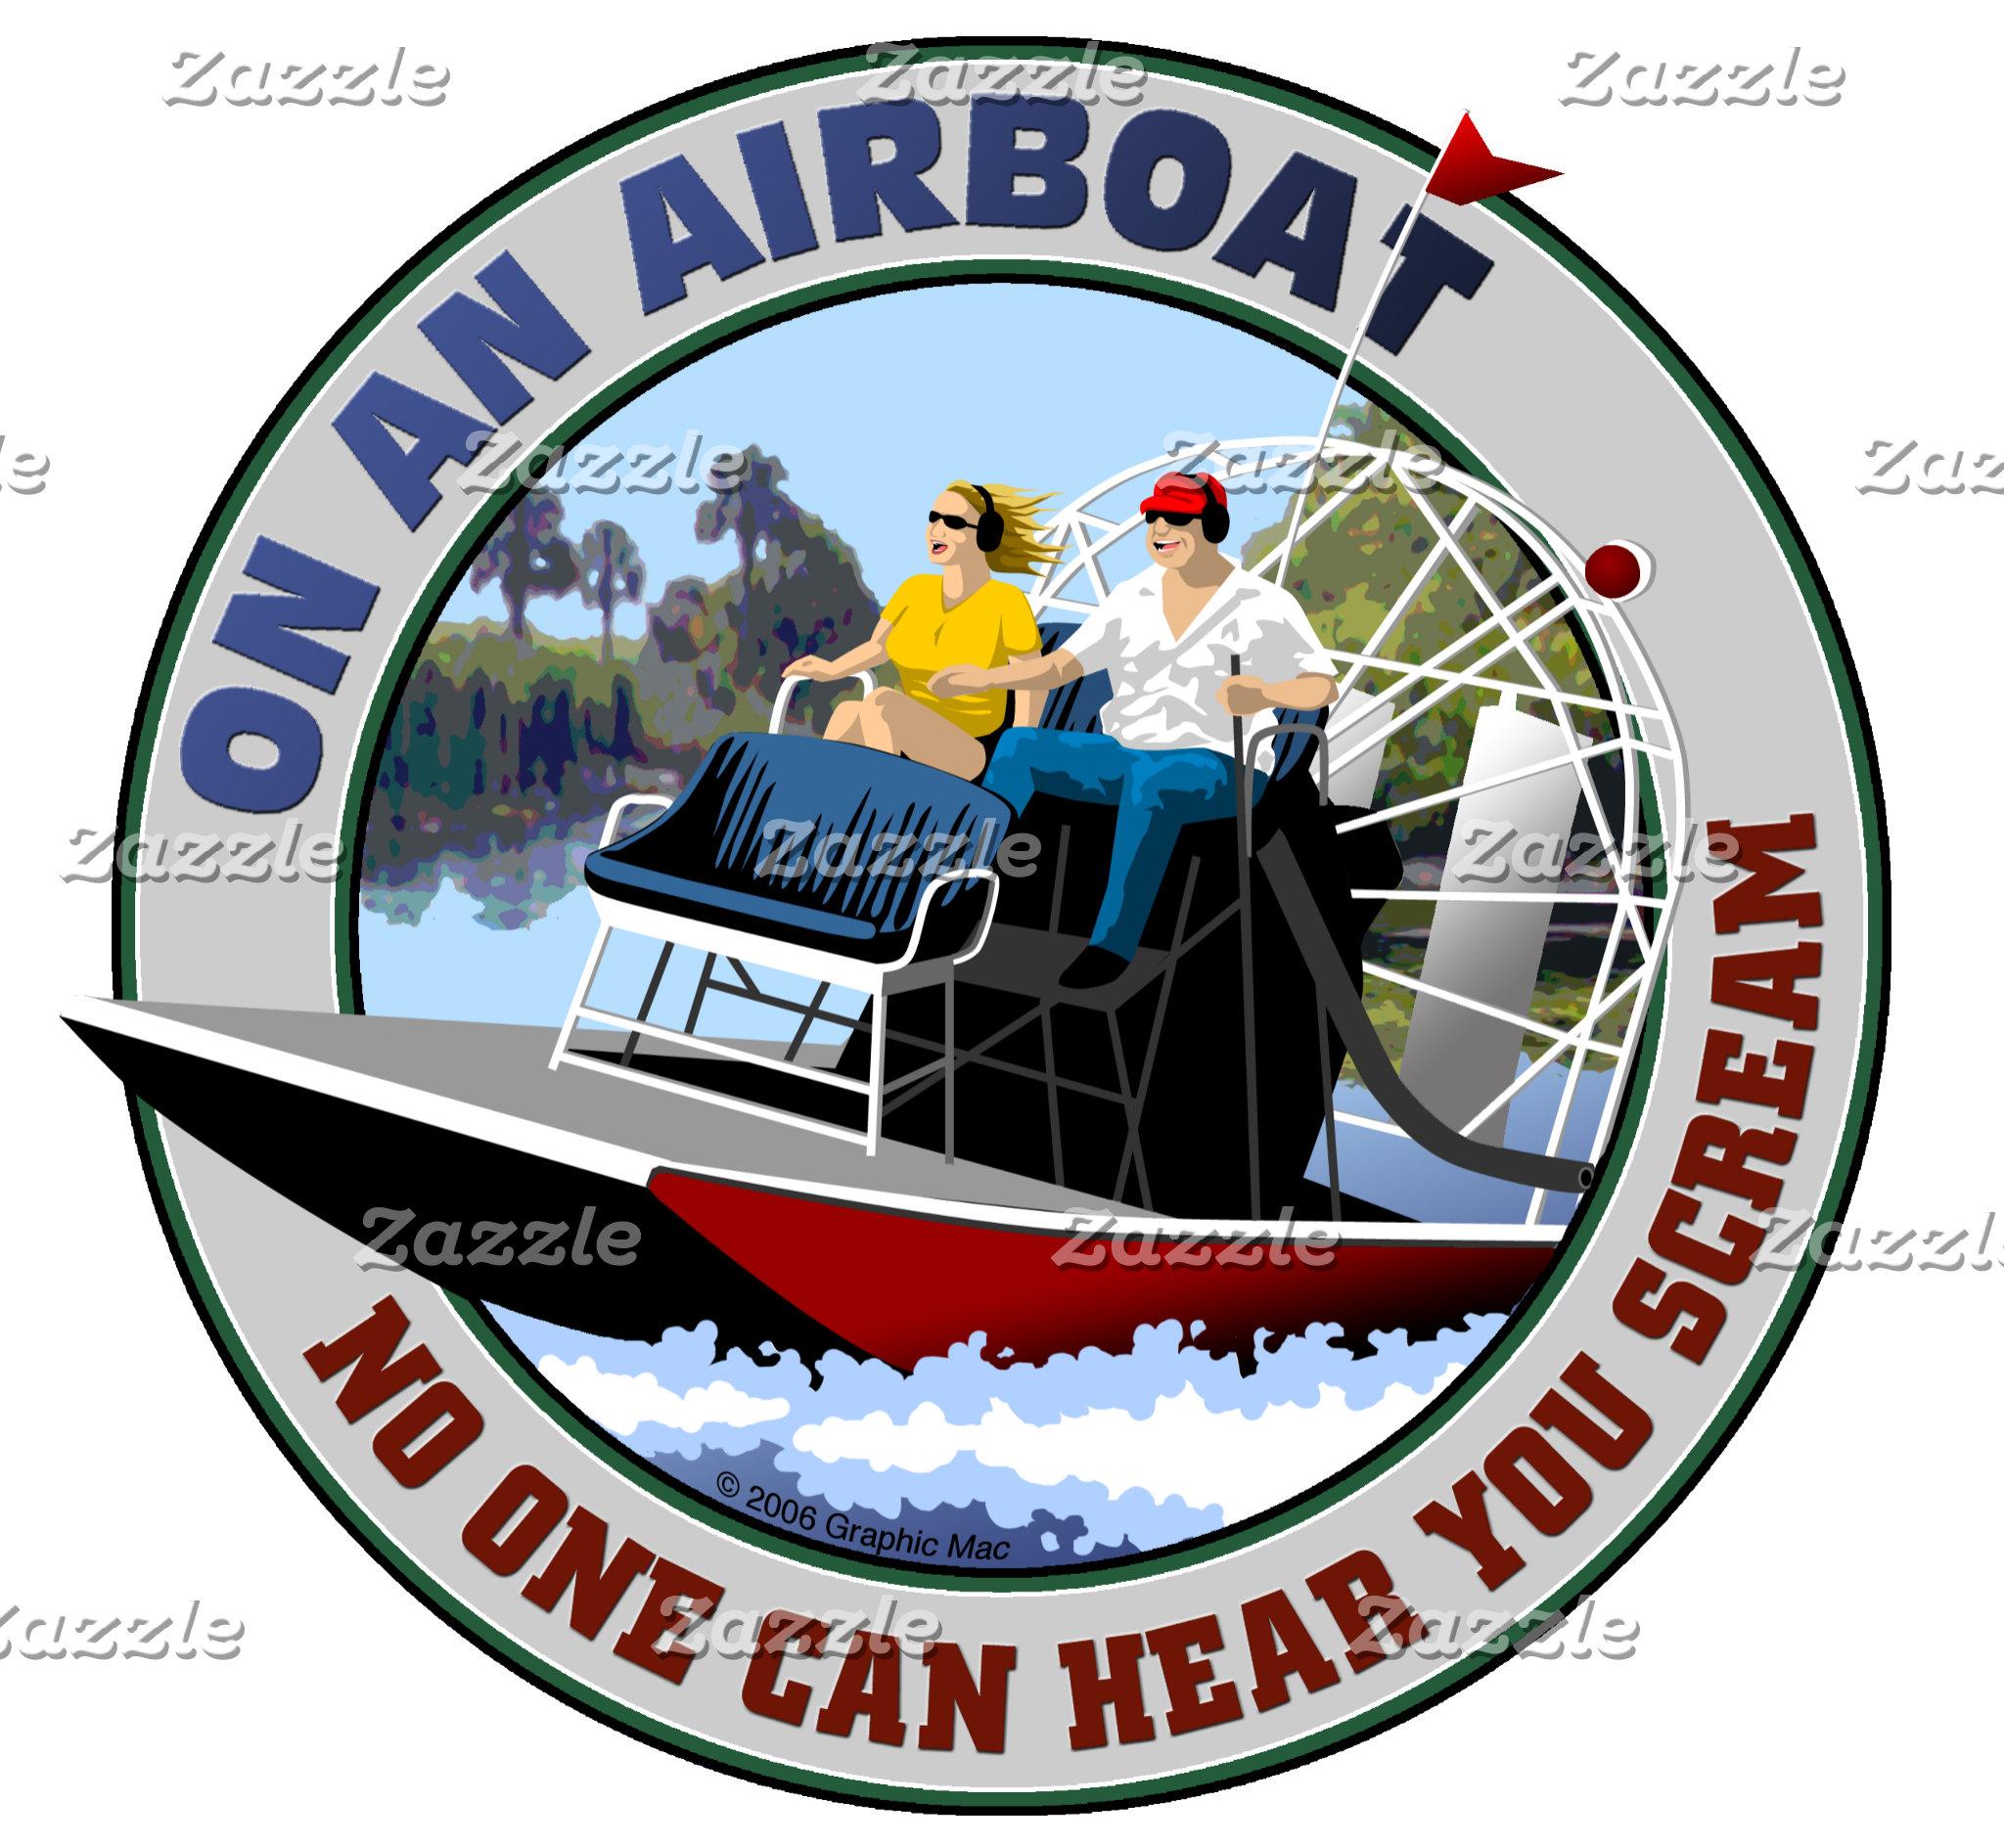 Boating, Fishing and Hunting